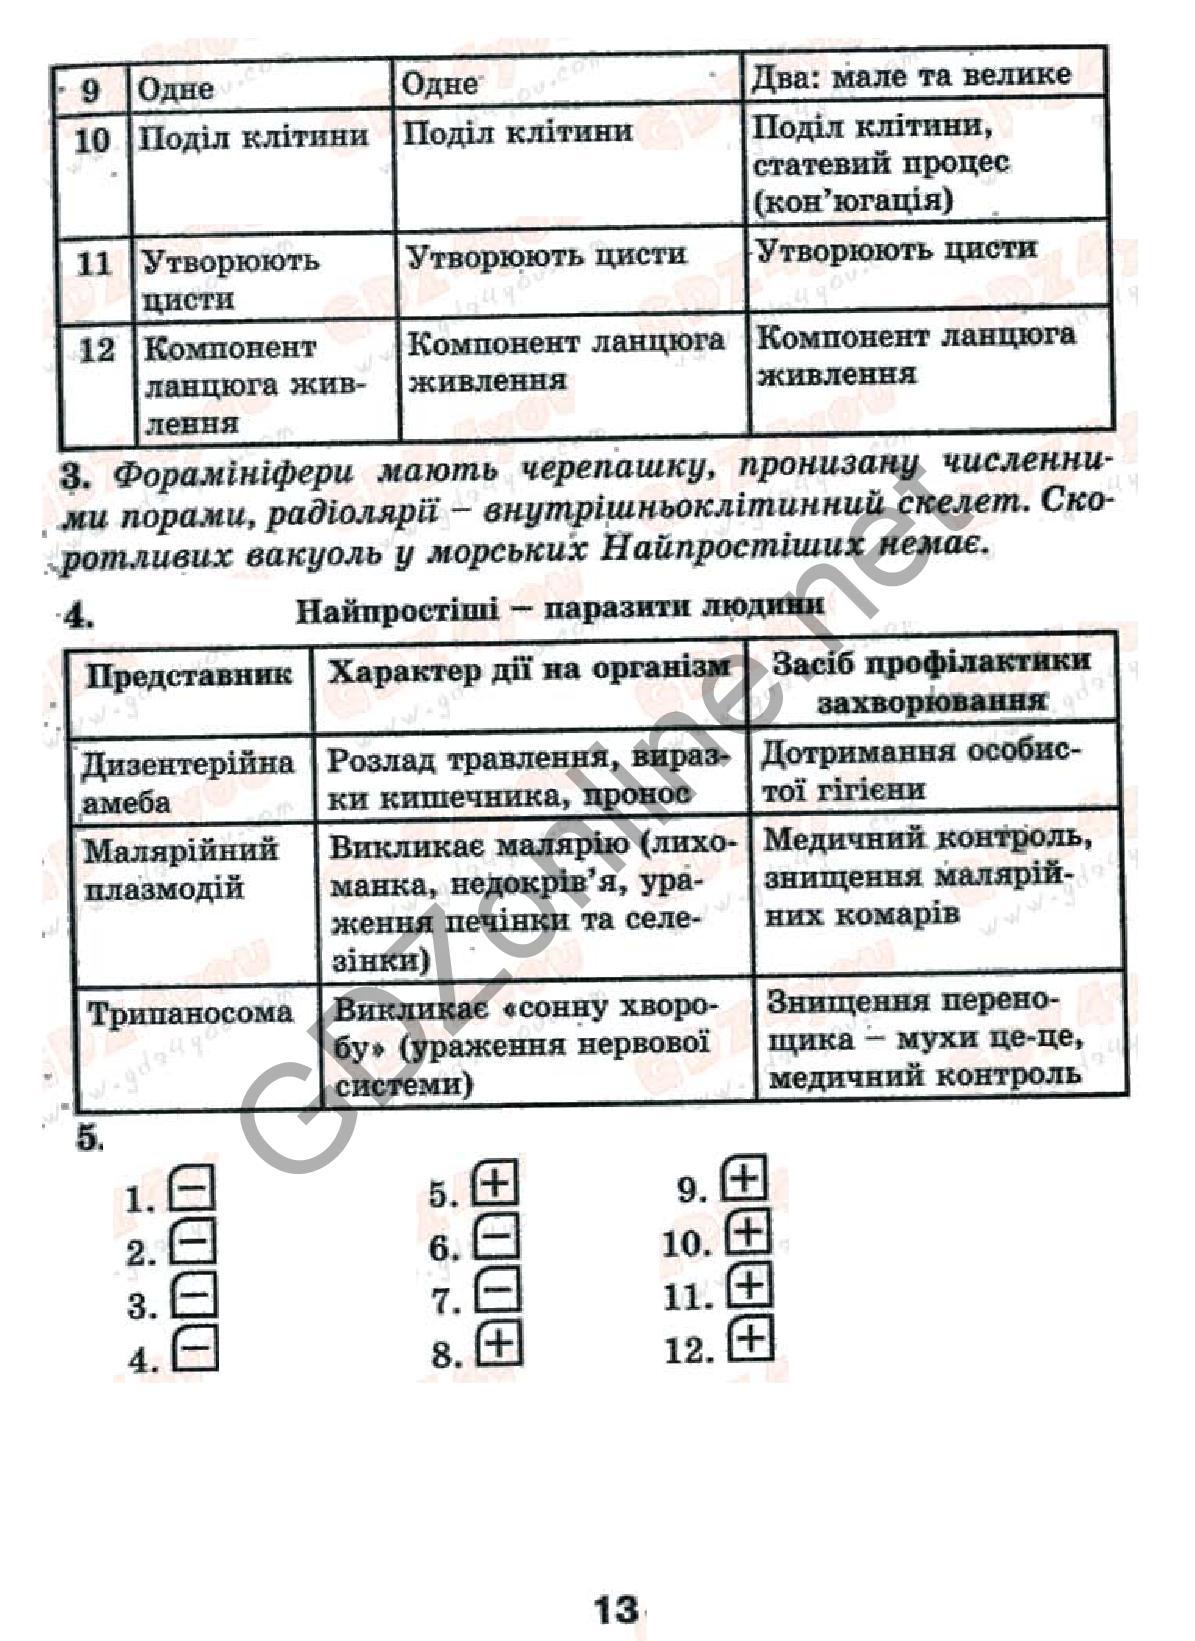 Гдз биология тетрадь 9 класс таллина котик